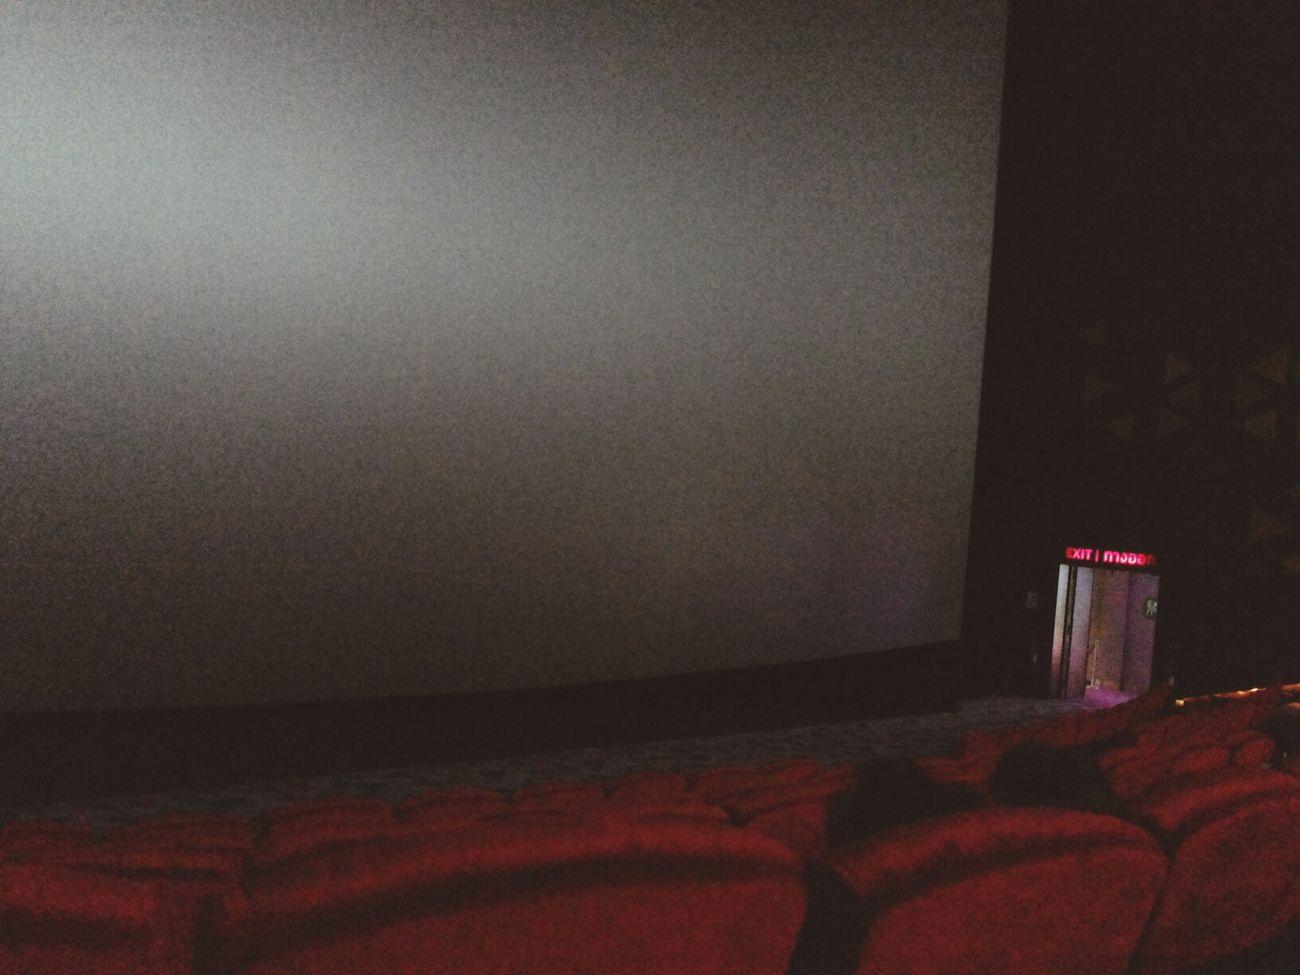 Captain America 2 สนุกมาก Movies Imax Hatyai Cineplex Central Festival Hatyai